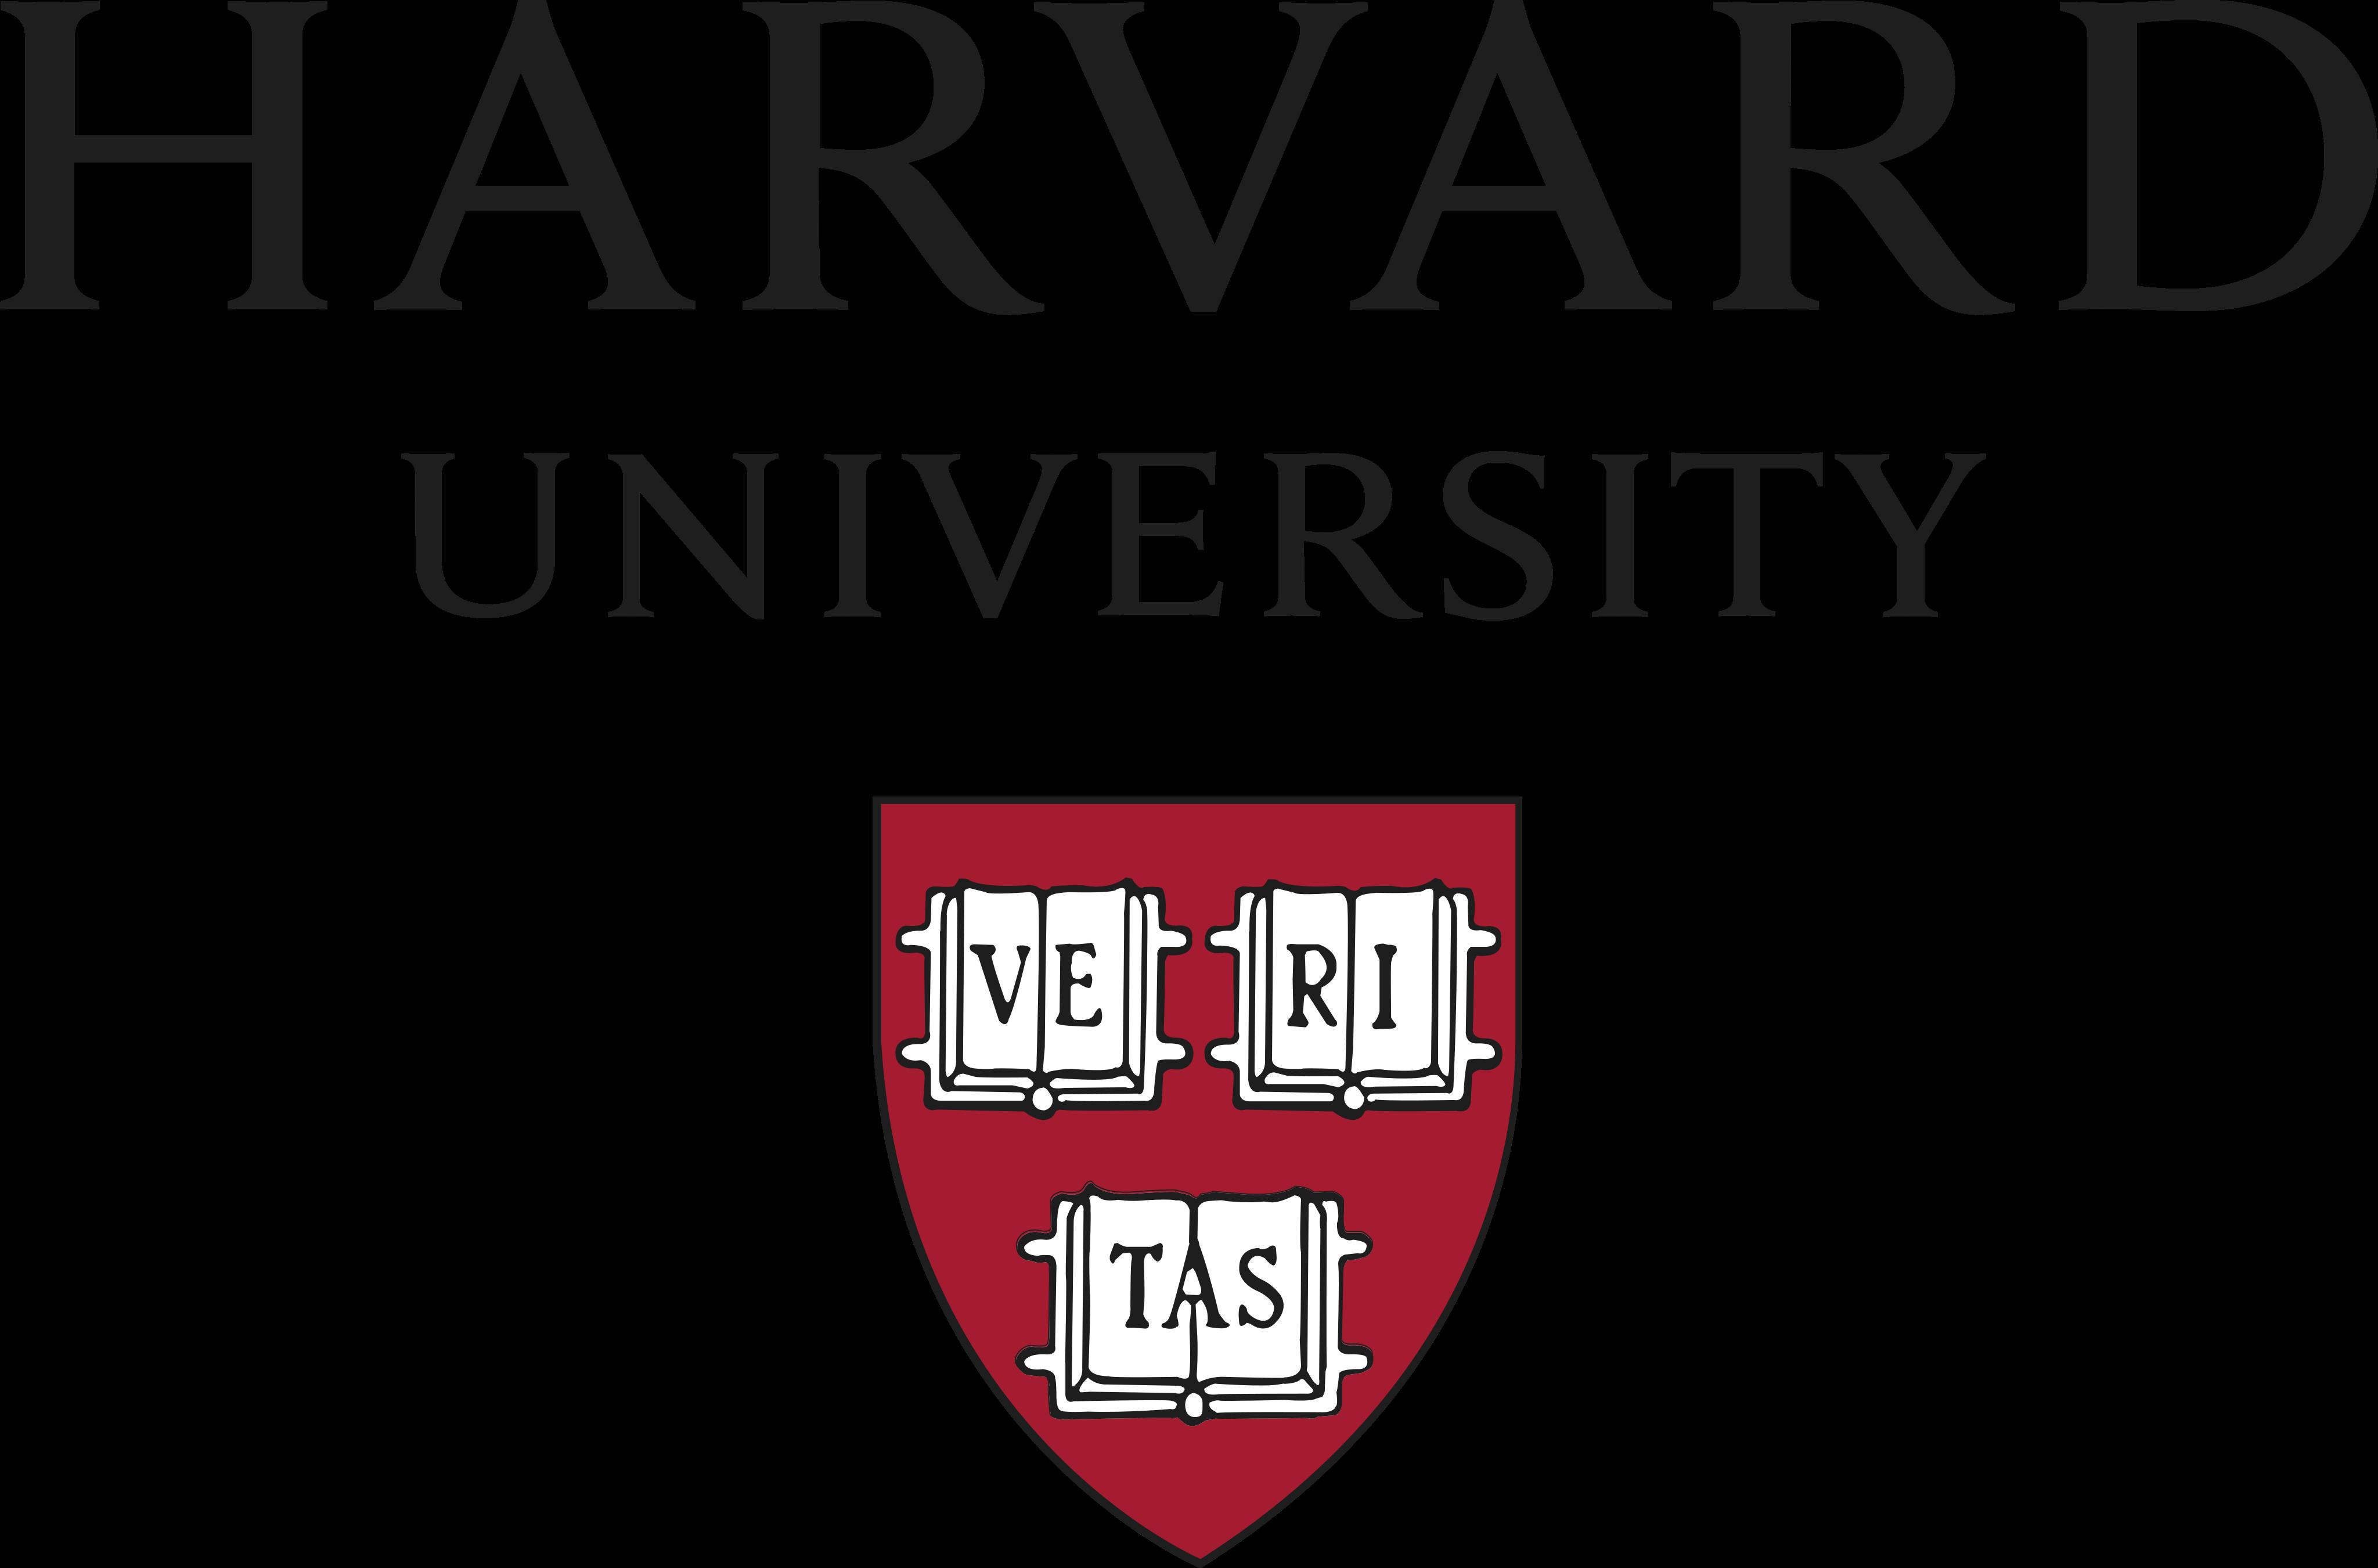 harvard university logo 1 - Universidad Harvard Logo